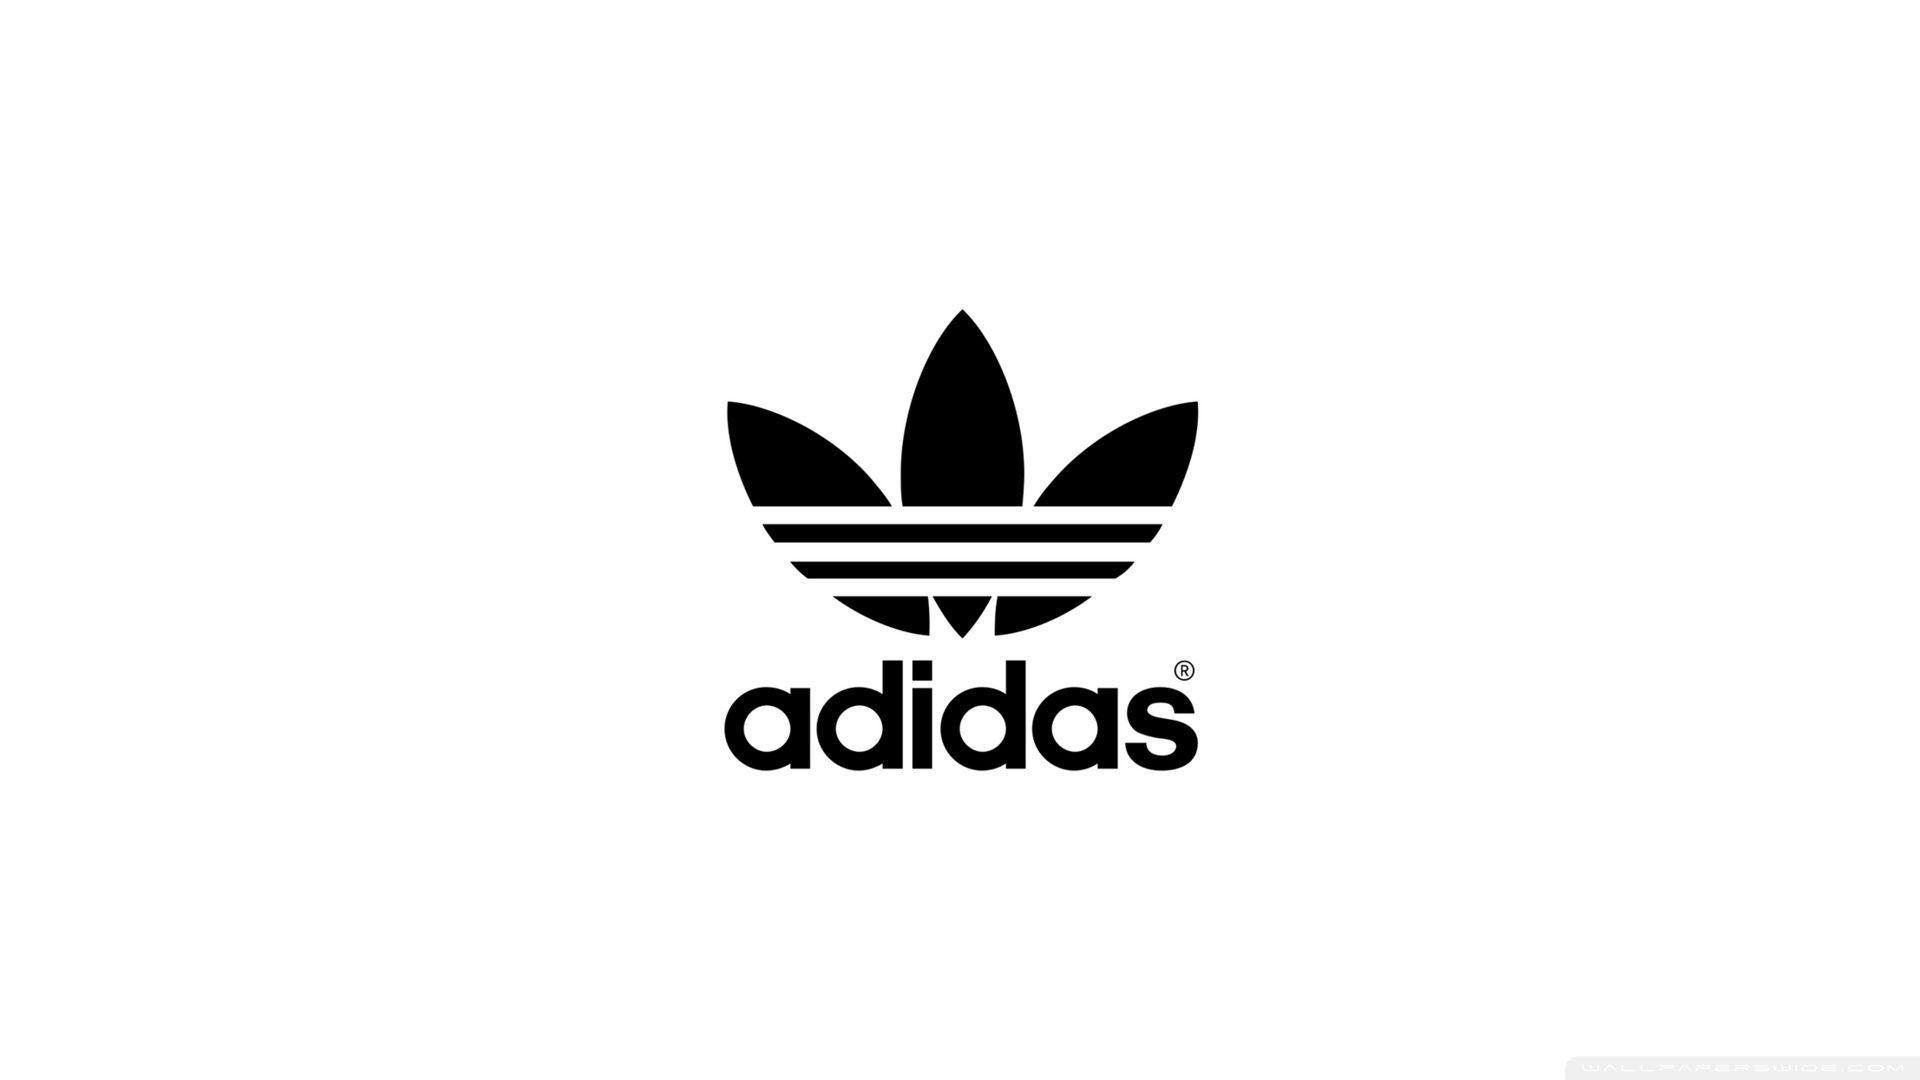 Adidas Computer Wallpapers Top Free Adidas Computer Backgrounds Wallpaperaccess